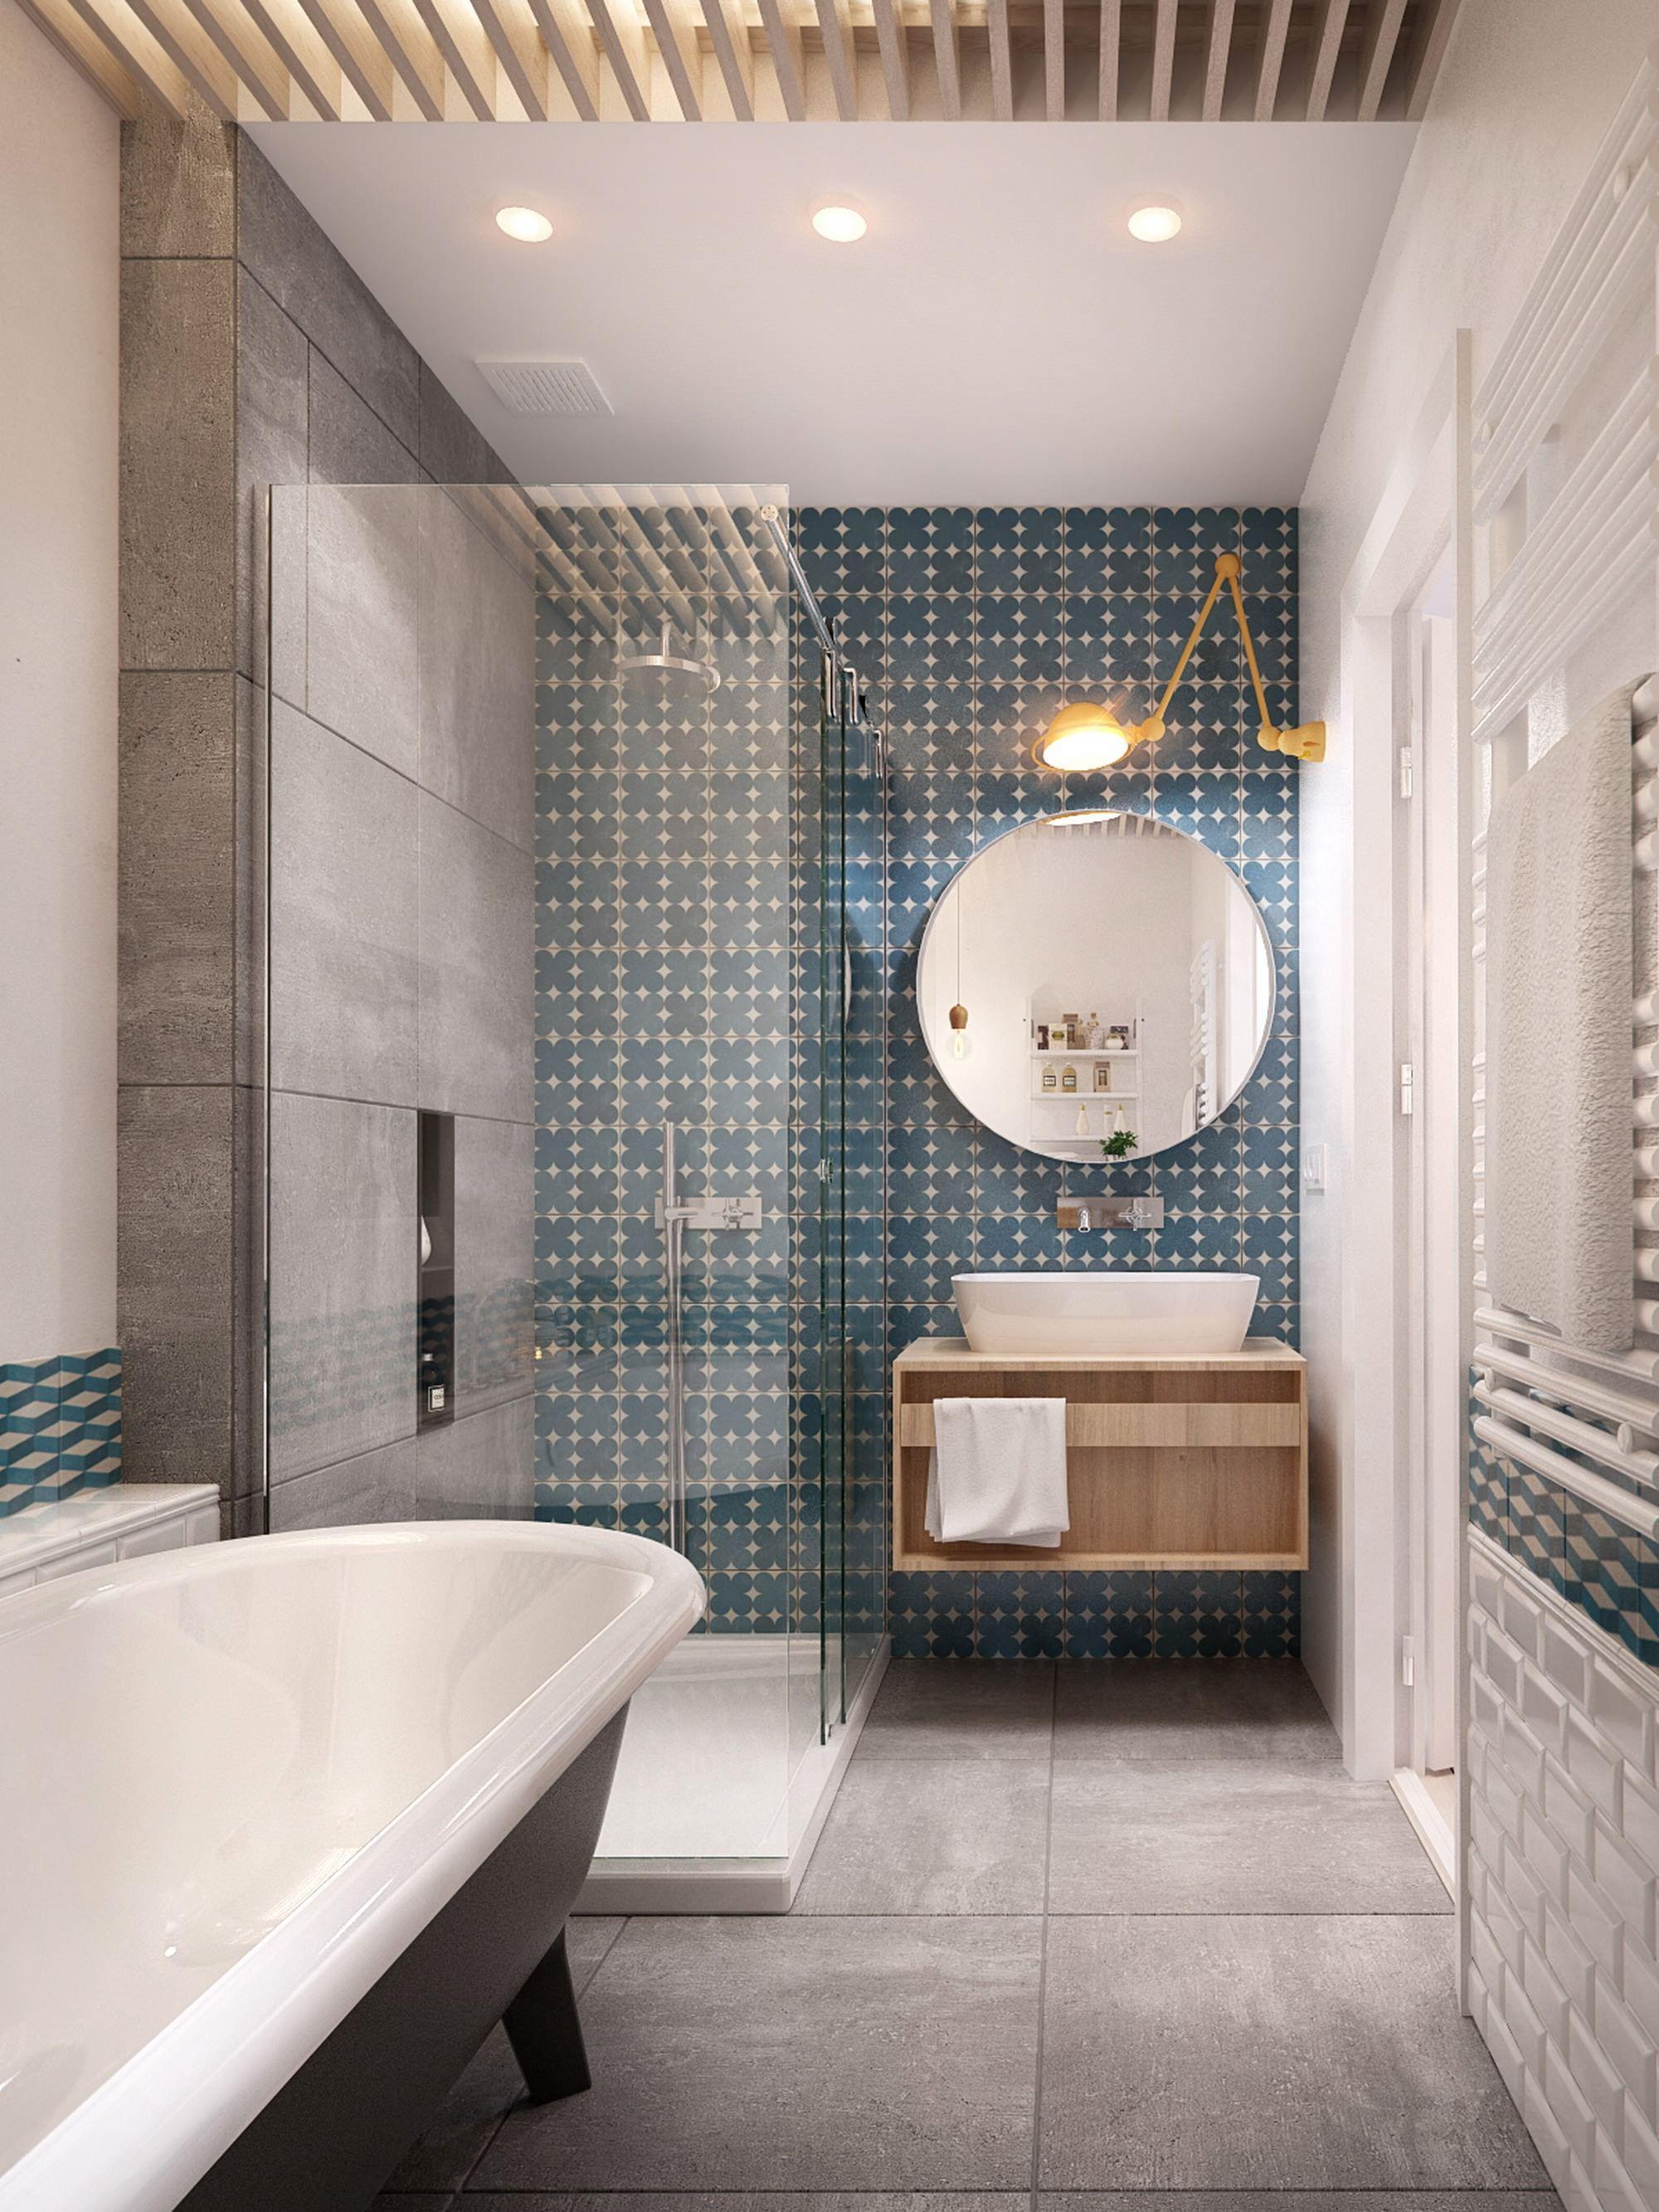 2018 Design Trends For The Bathroom Emily Henderson Bathroom